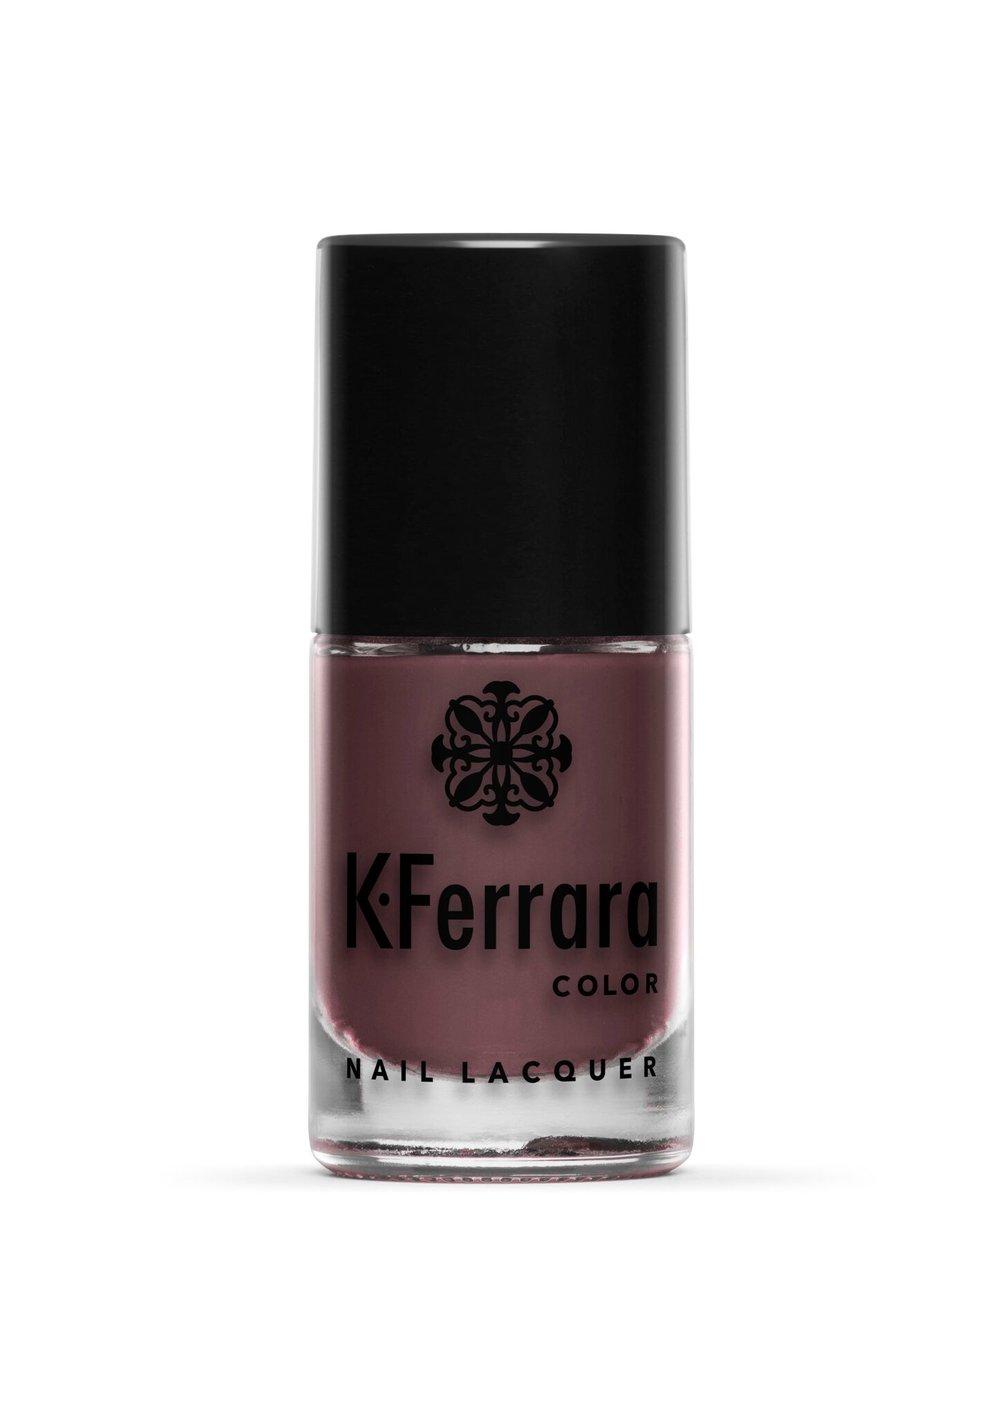 KFerrara Bottle Kathryn.jpg